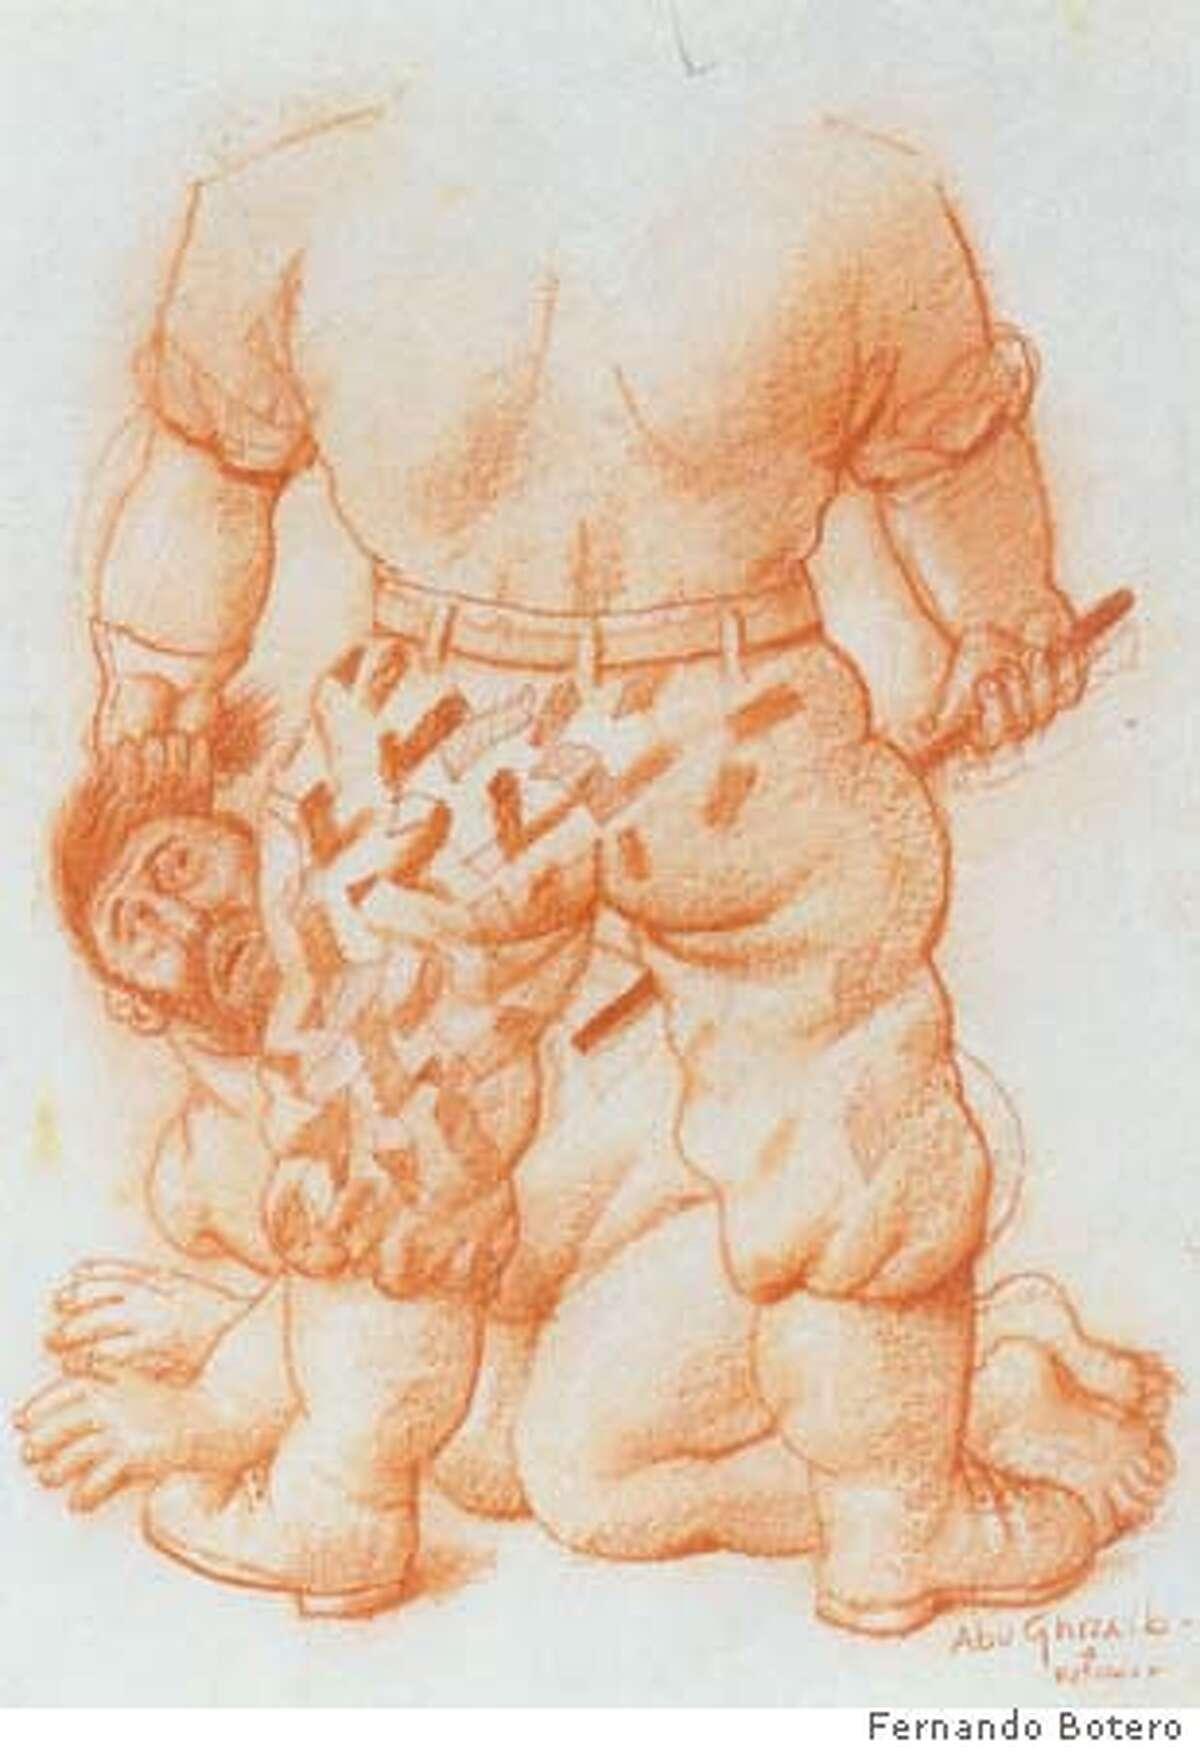 Botero, Abu Ghraib 4, 2004, 40 x 30 cm, sanguine on paper Ran on: 01-29-2007 Abu Ghraib 6 (2004), pencil on paper.